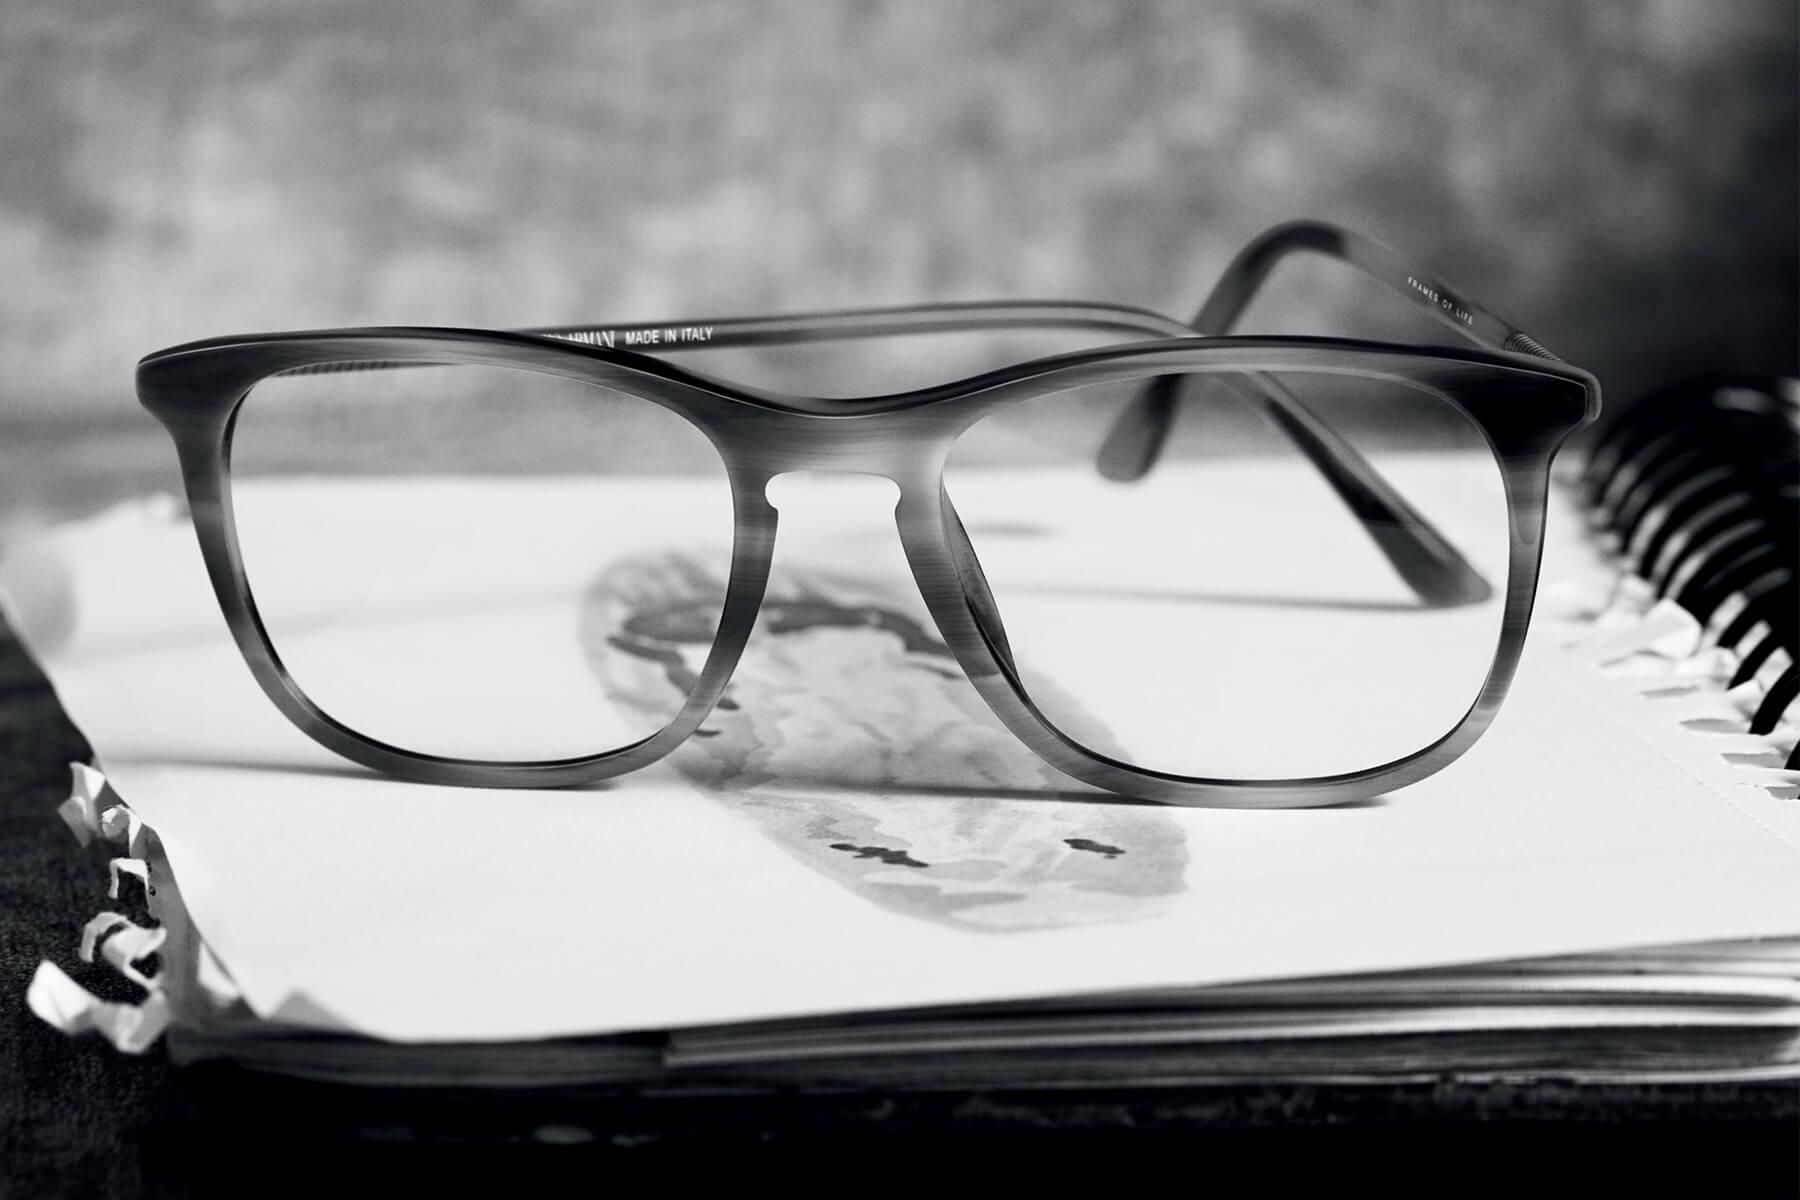 giorgio armani brillen monturen optiek lammerant deinze. Black Bedroom Furniture Sets. Home Design Ideas